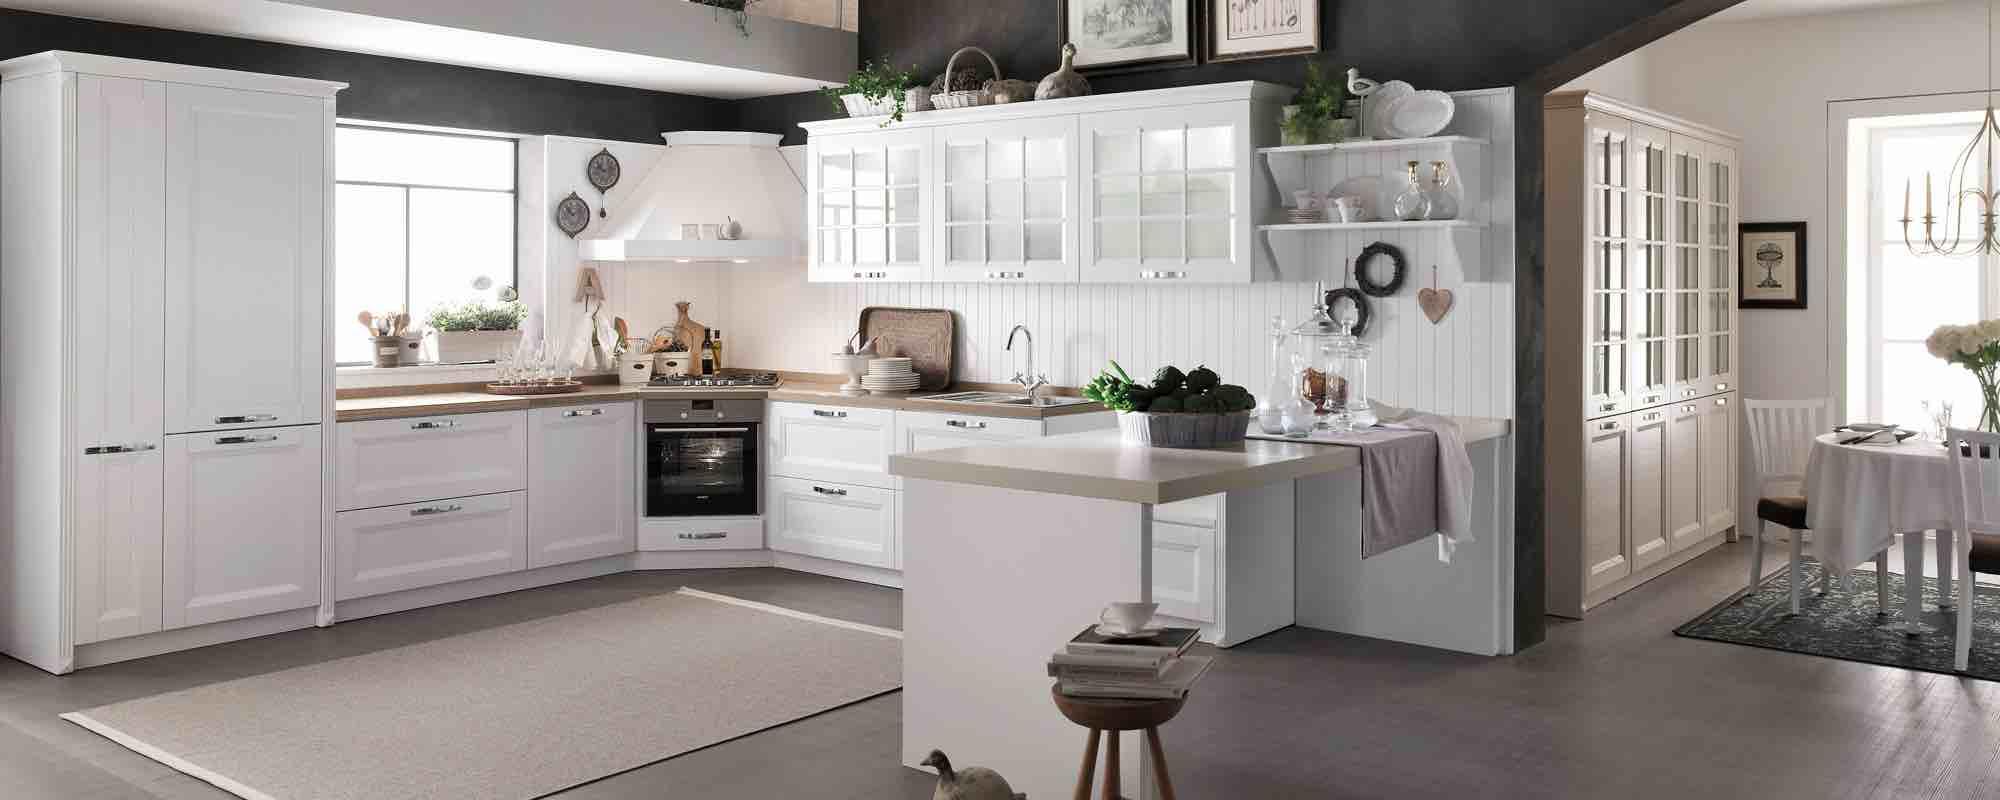 Cucine contemporanee vibo valentia scarcia arredamenti for Cucine contemporanee